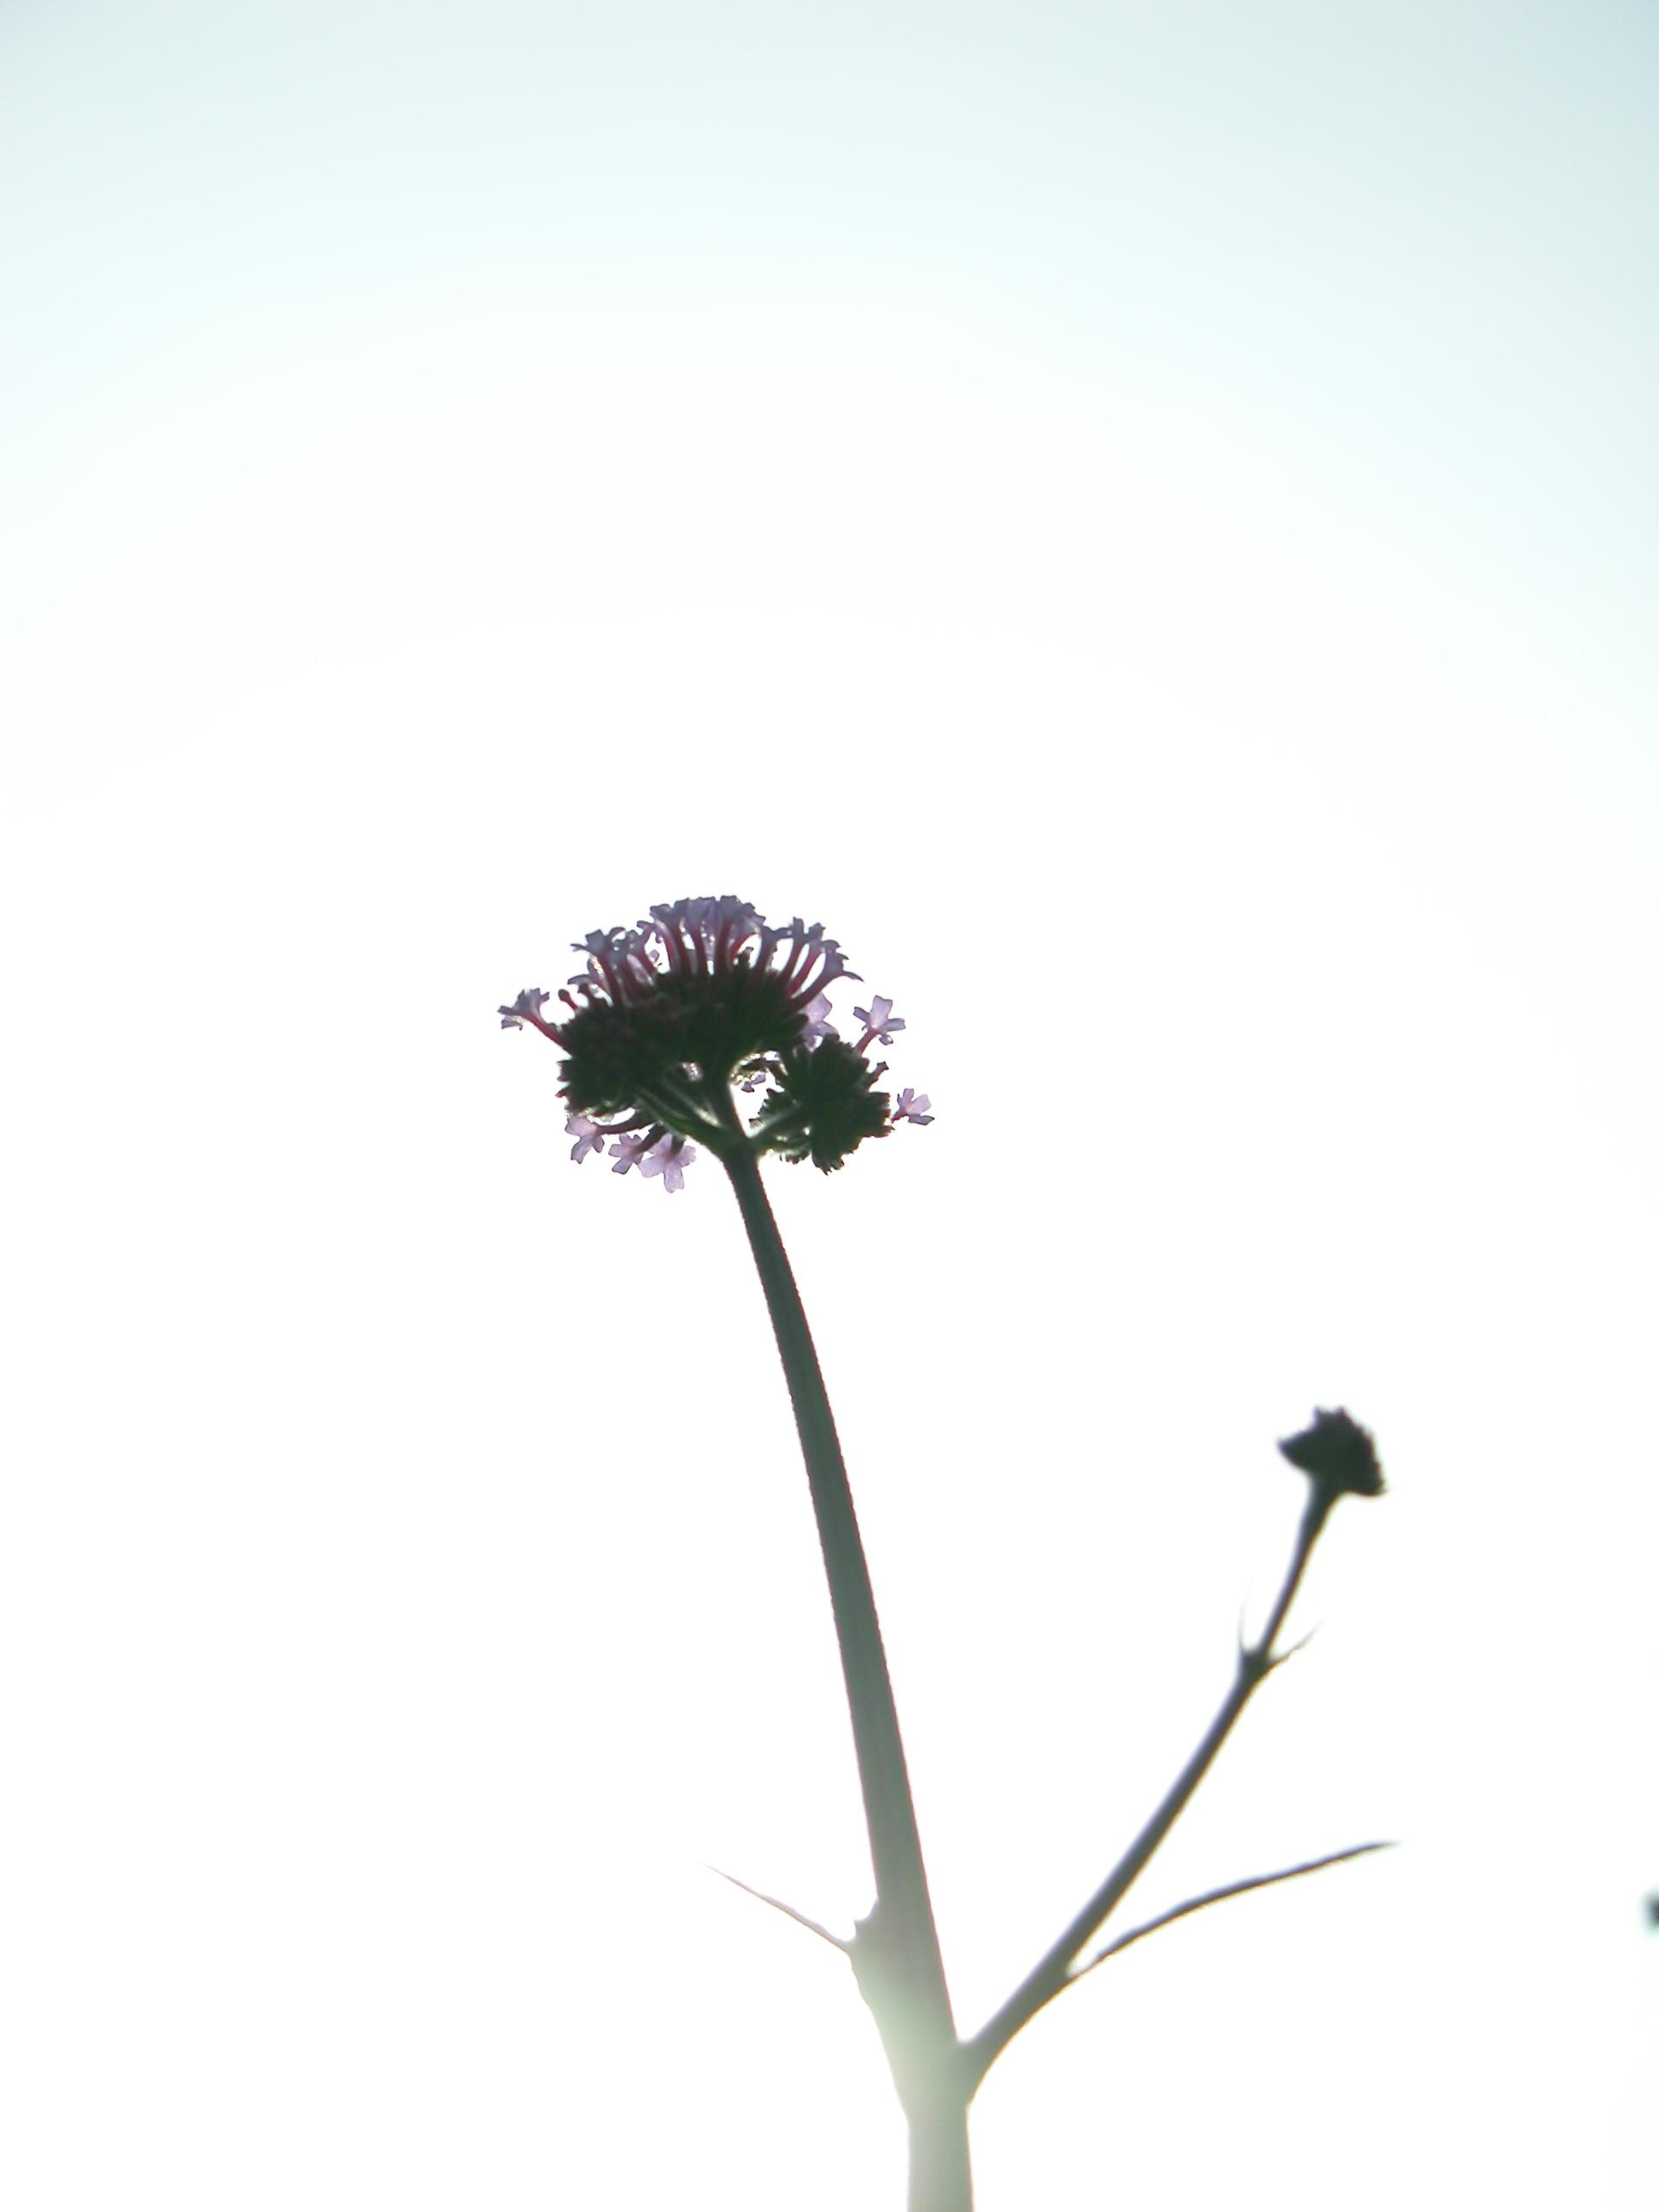 image.php?image=b13nature_plants025.jpg&dl=1